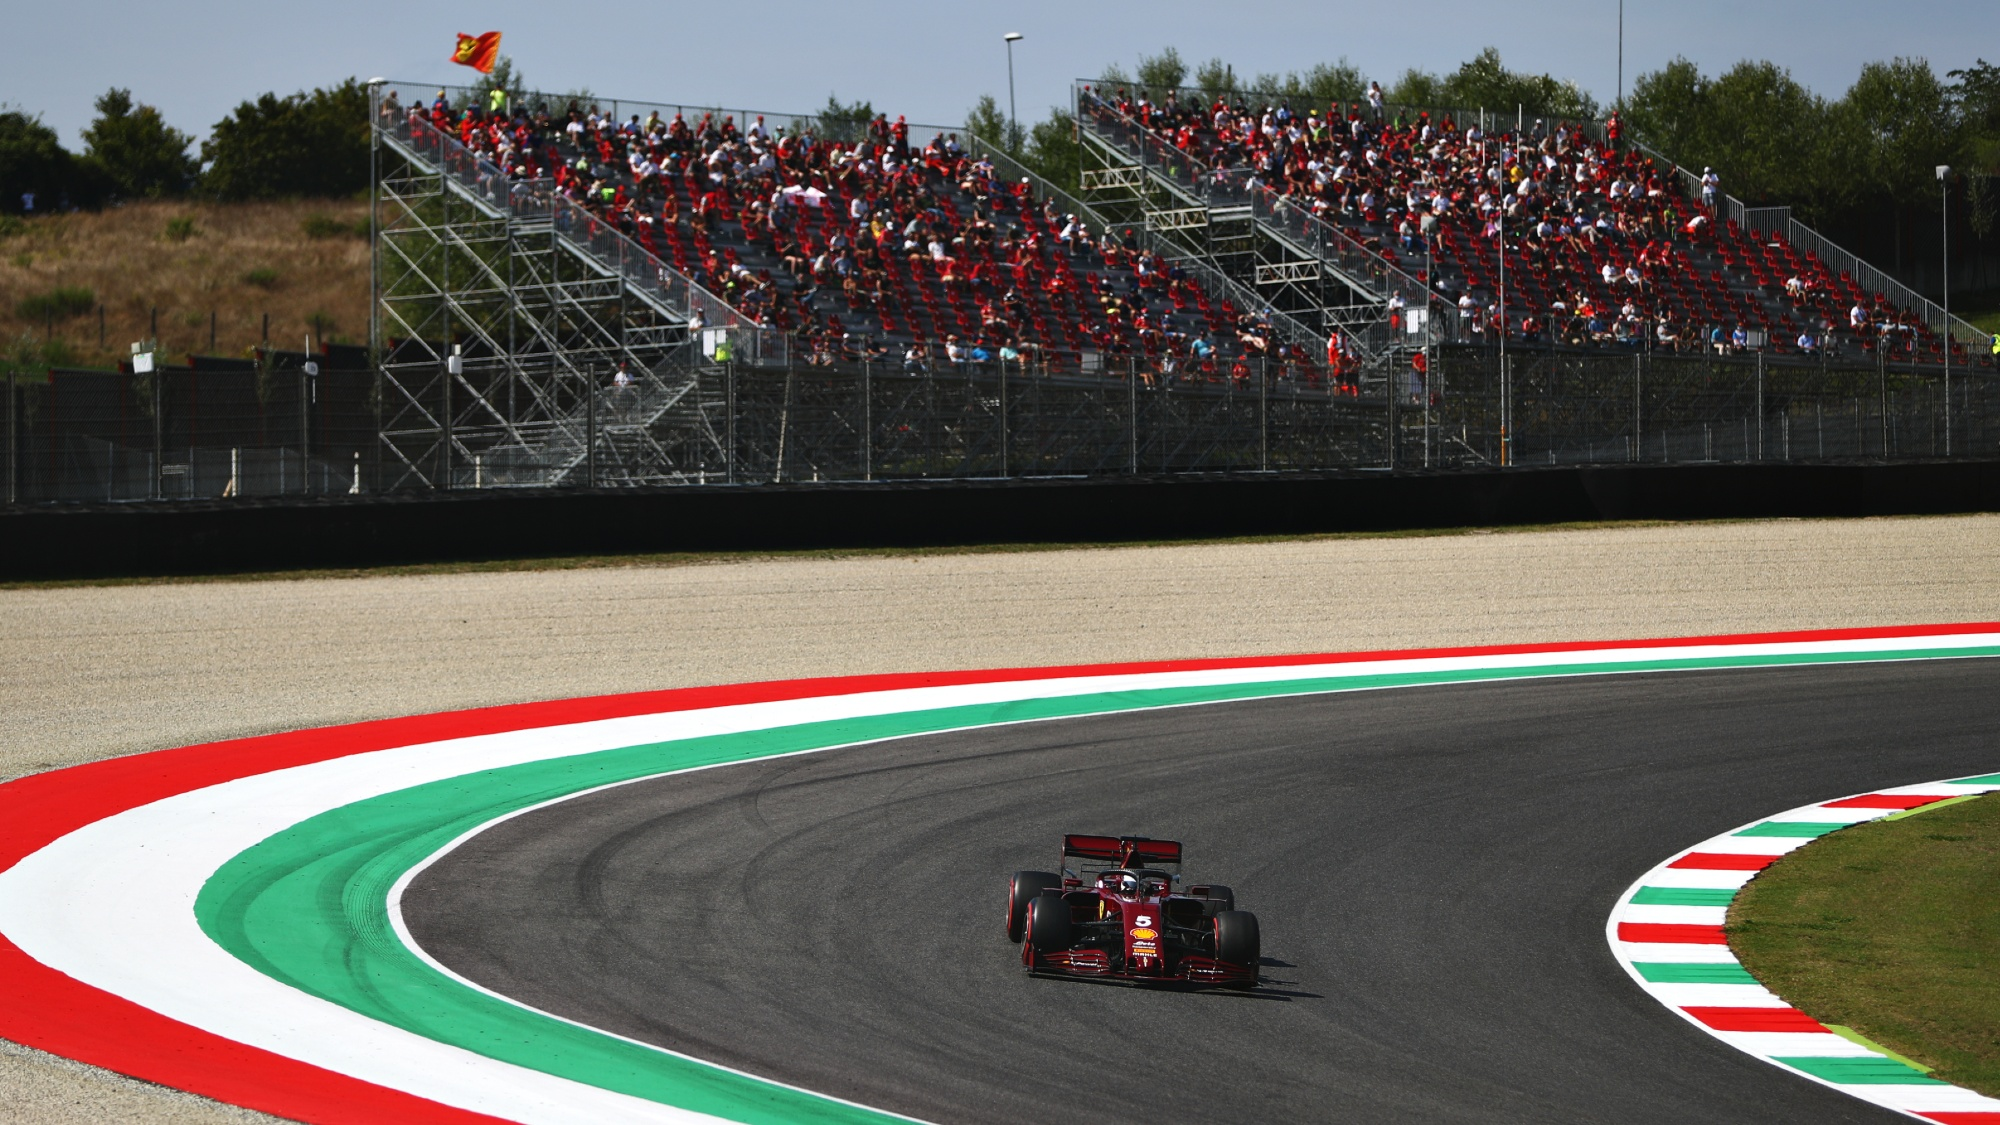 Sebastian Vettel, 2020 Mugello